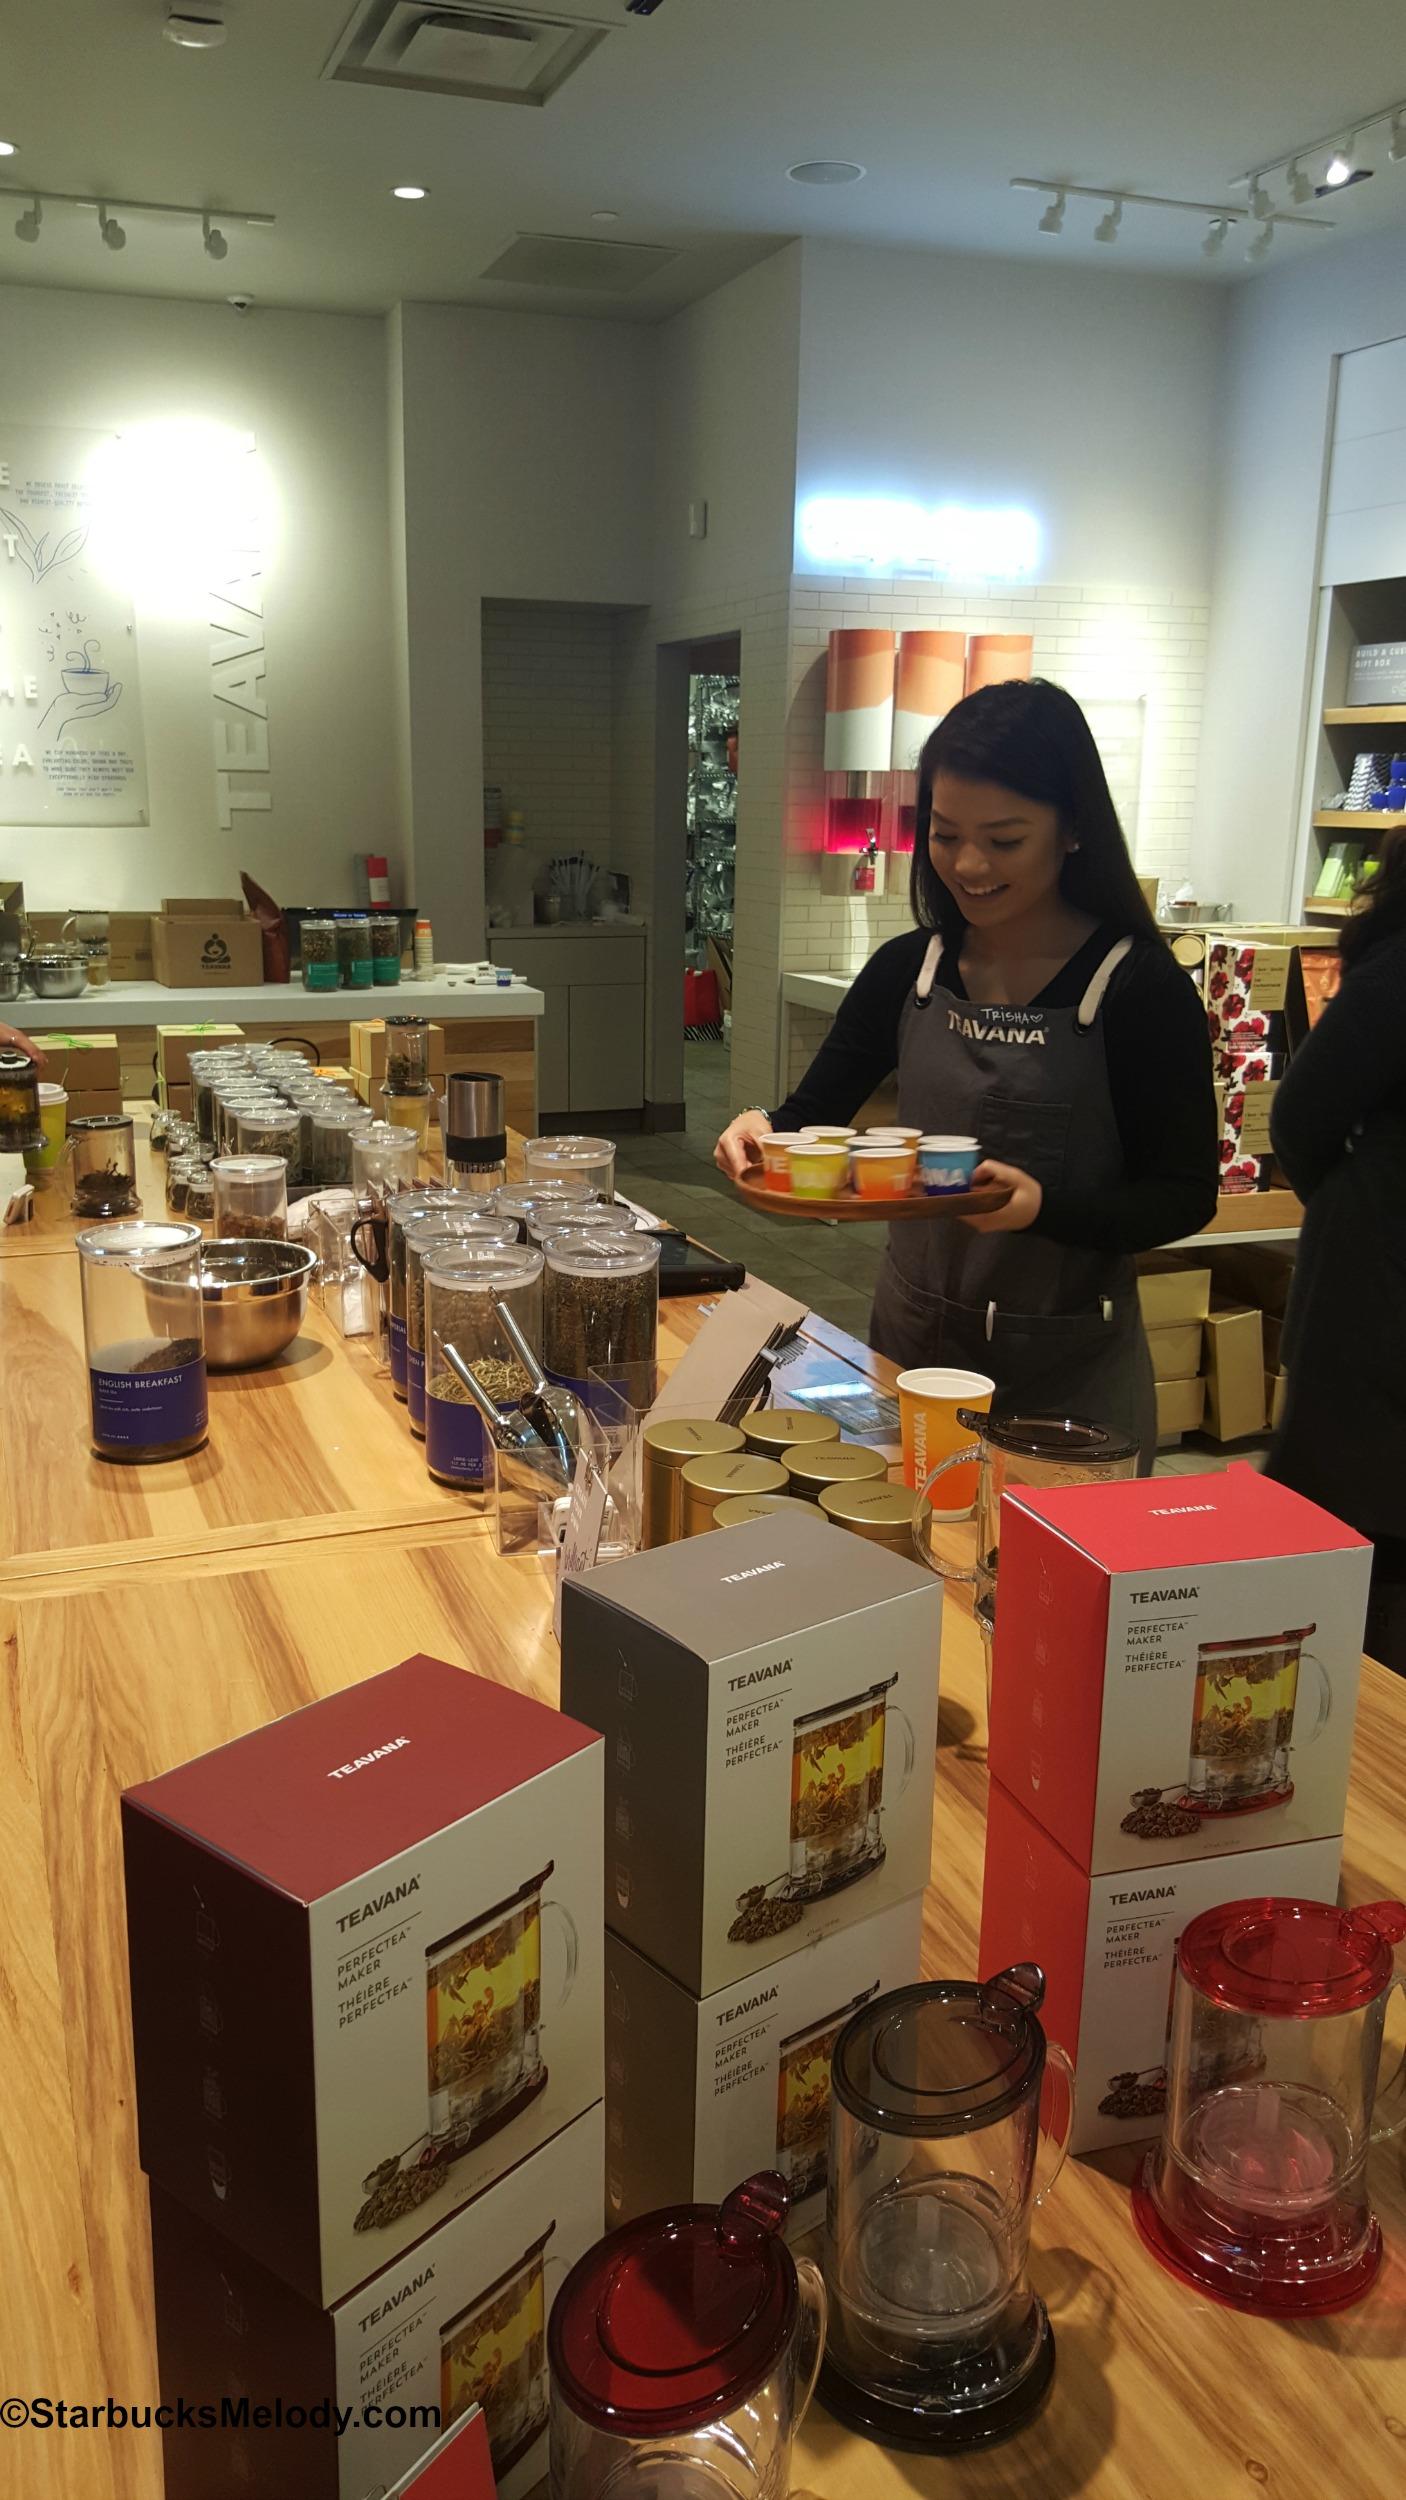 2 - 1 - 20151207_180739 trisha sampling tea.jpg